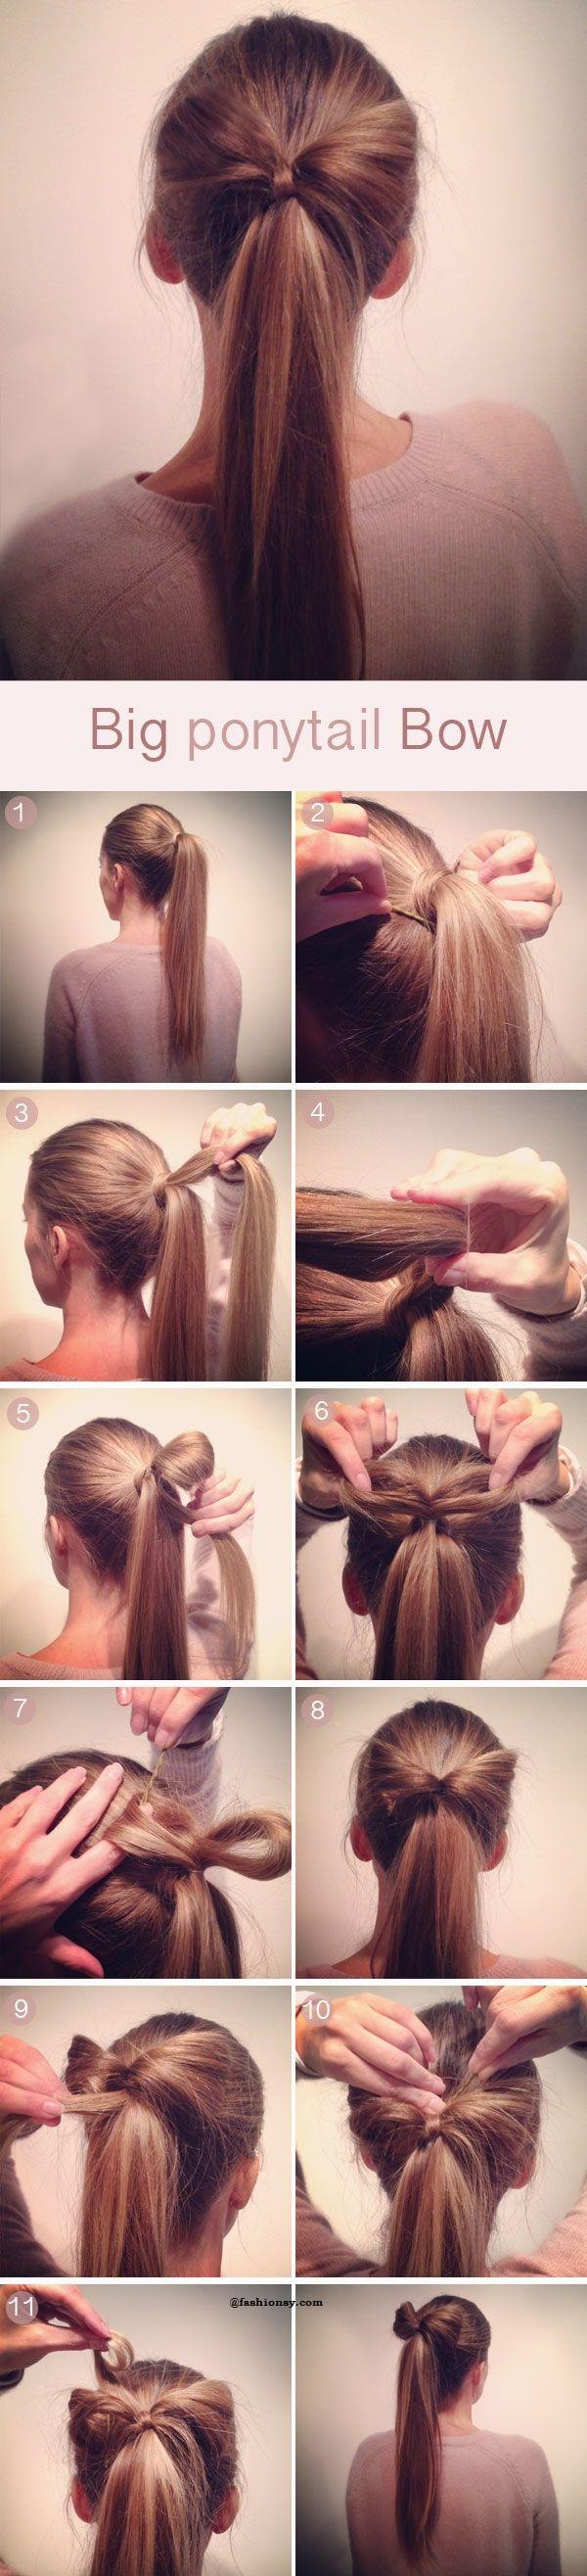 coiffure-simple-facile-13